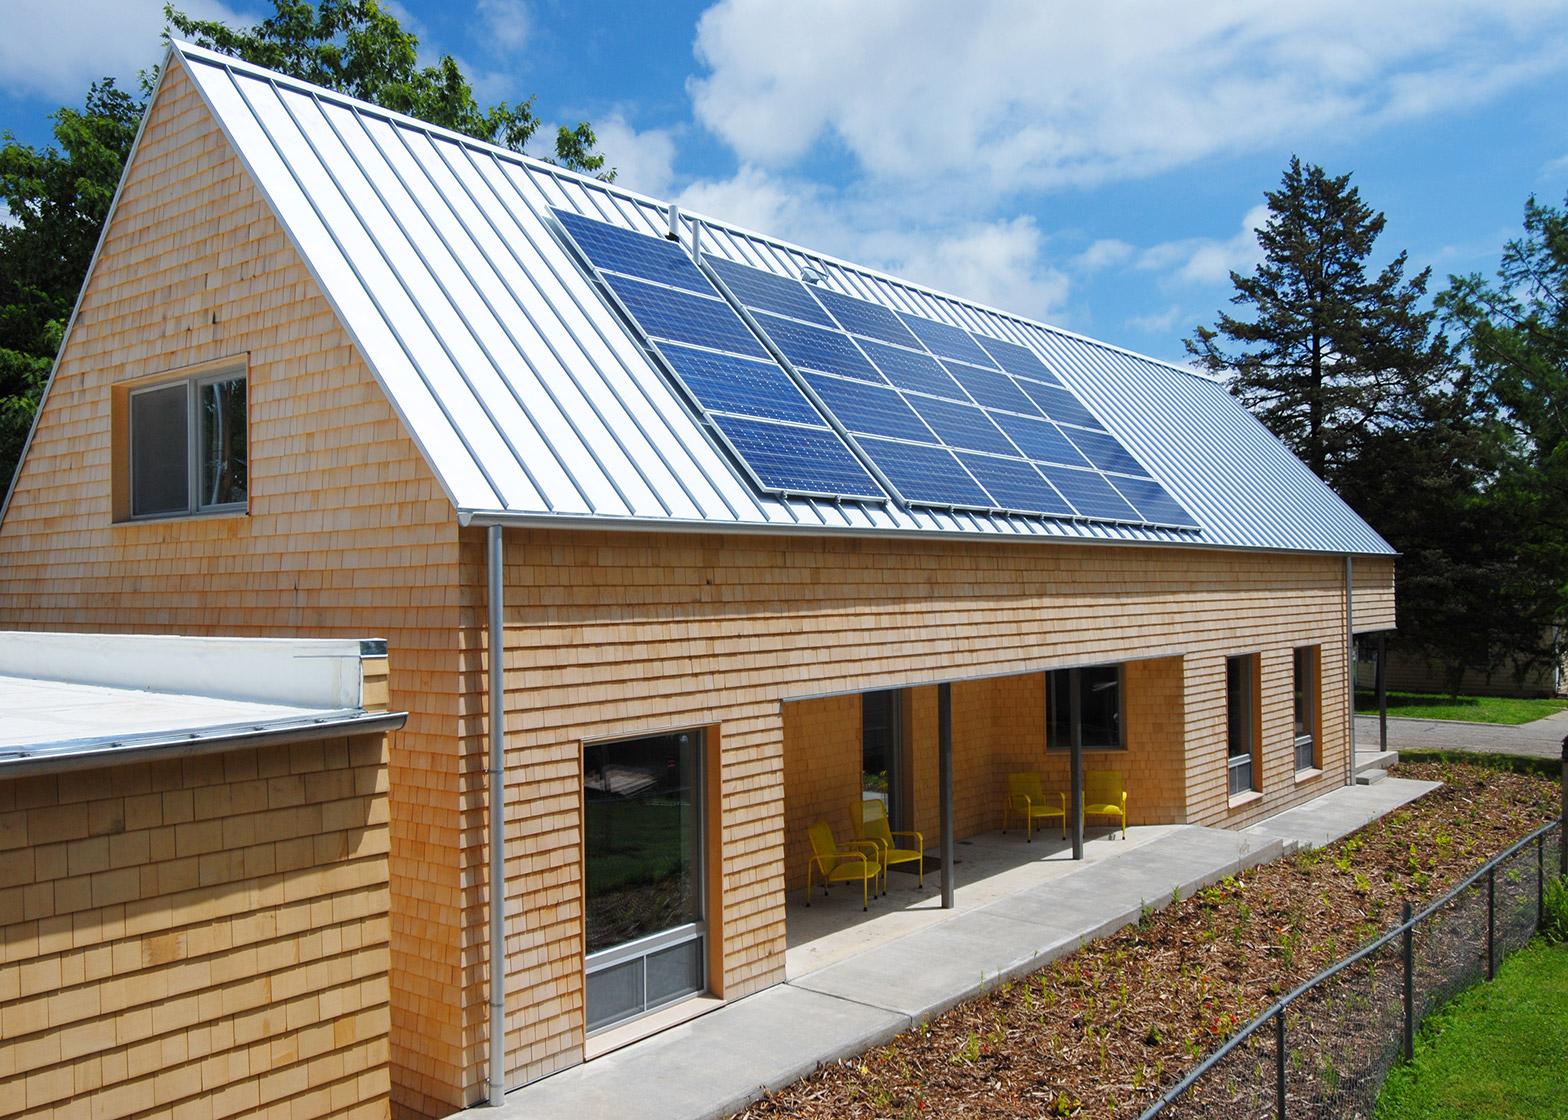 Studio 804 builds a net-zero energy Kansas home on